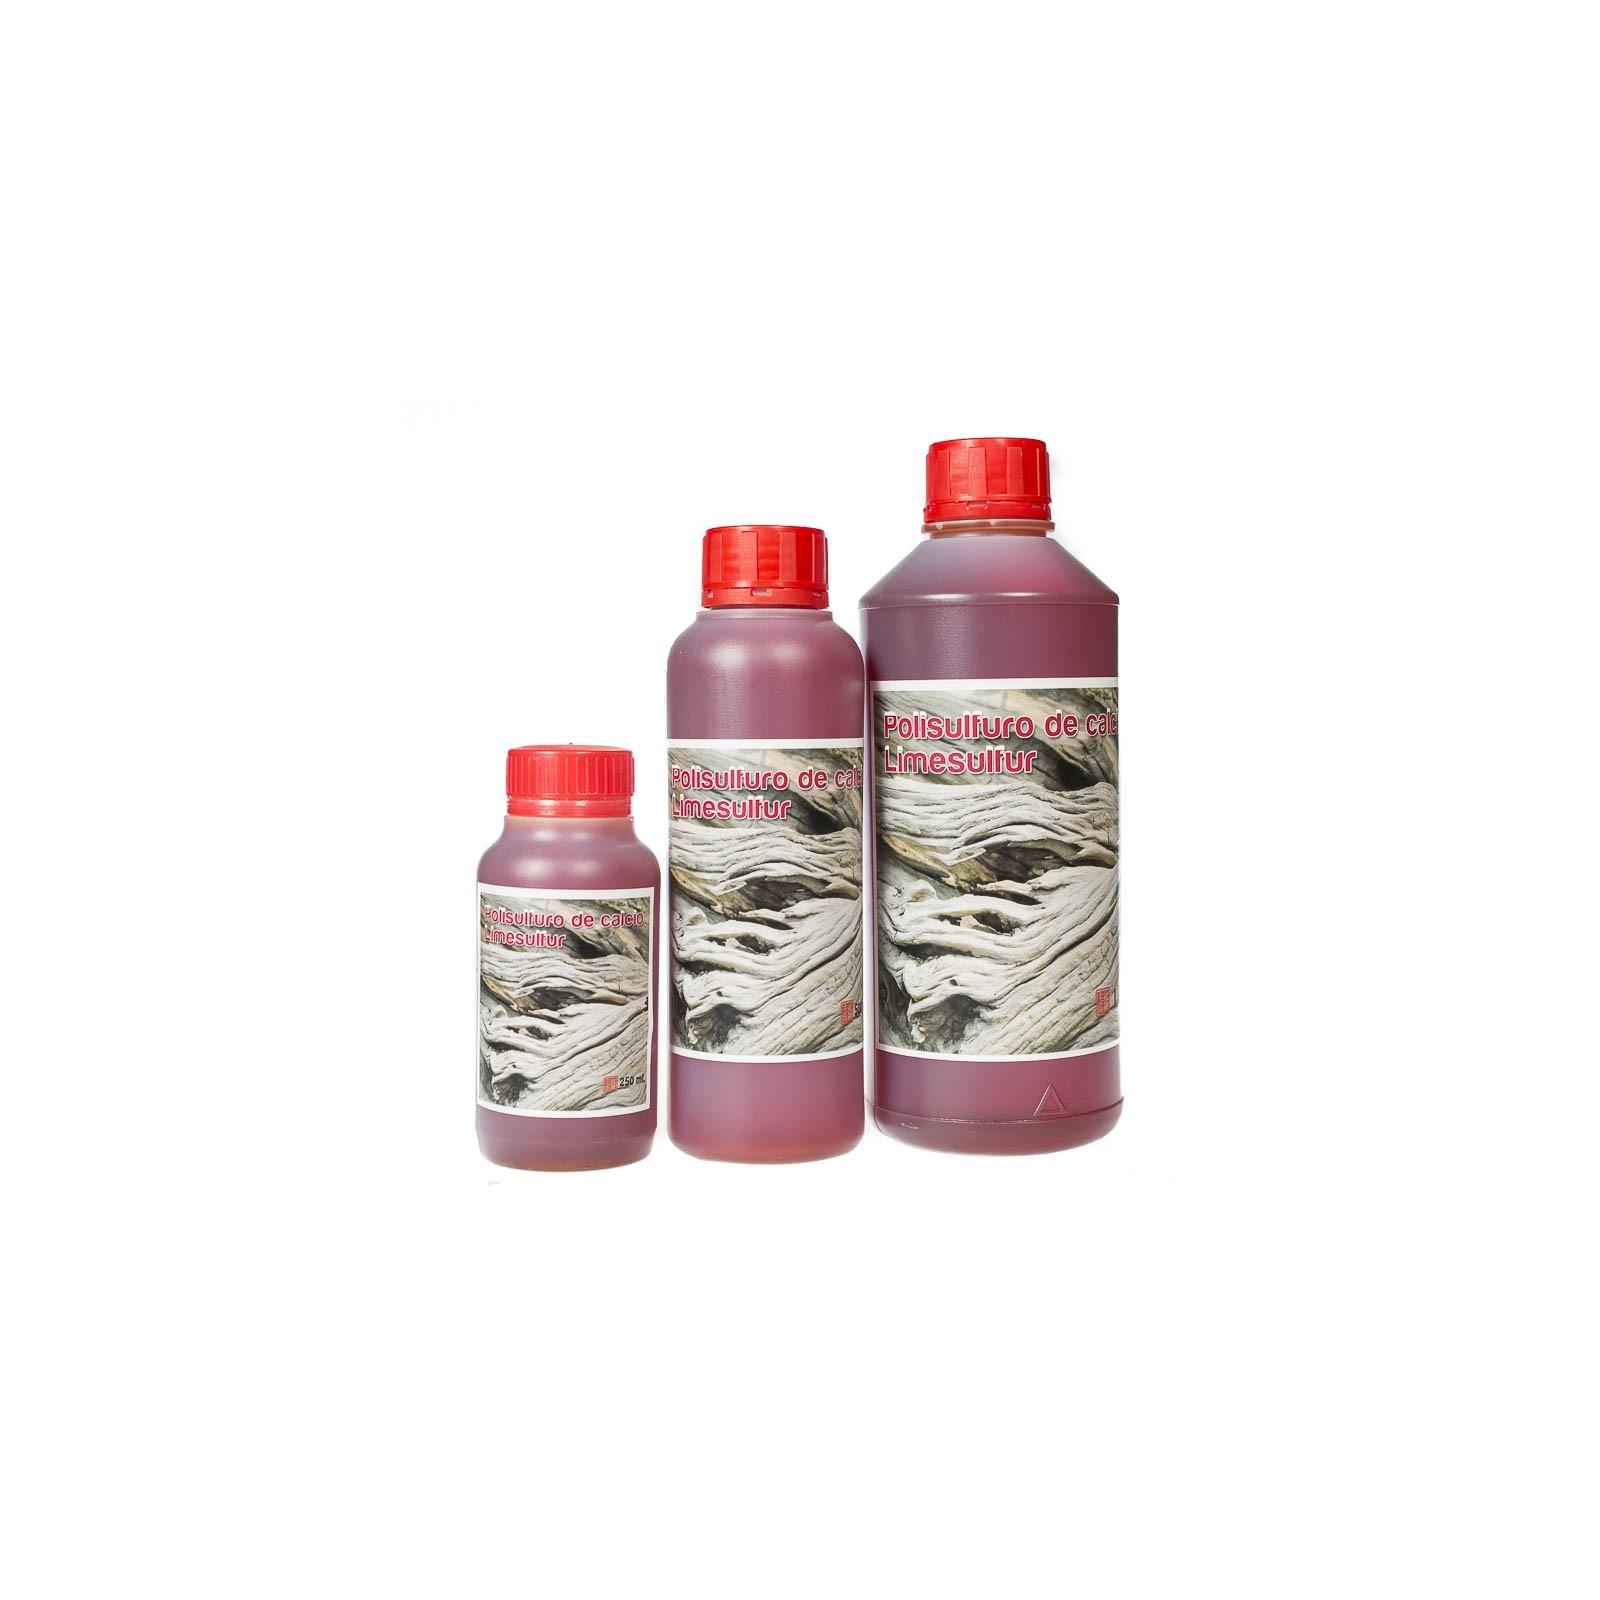 Limelsulfur Liquido de Jin